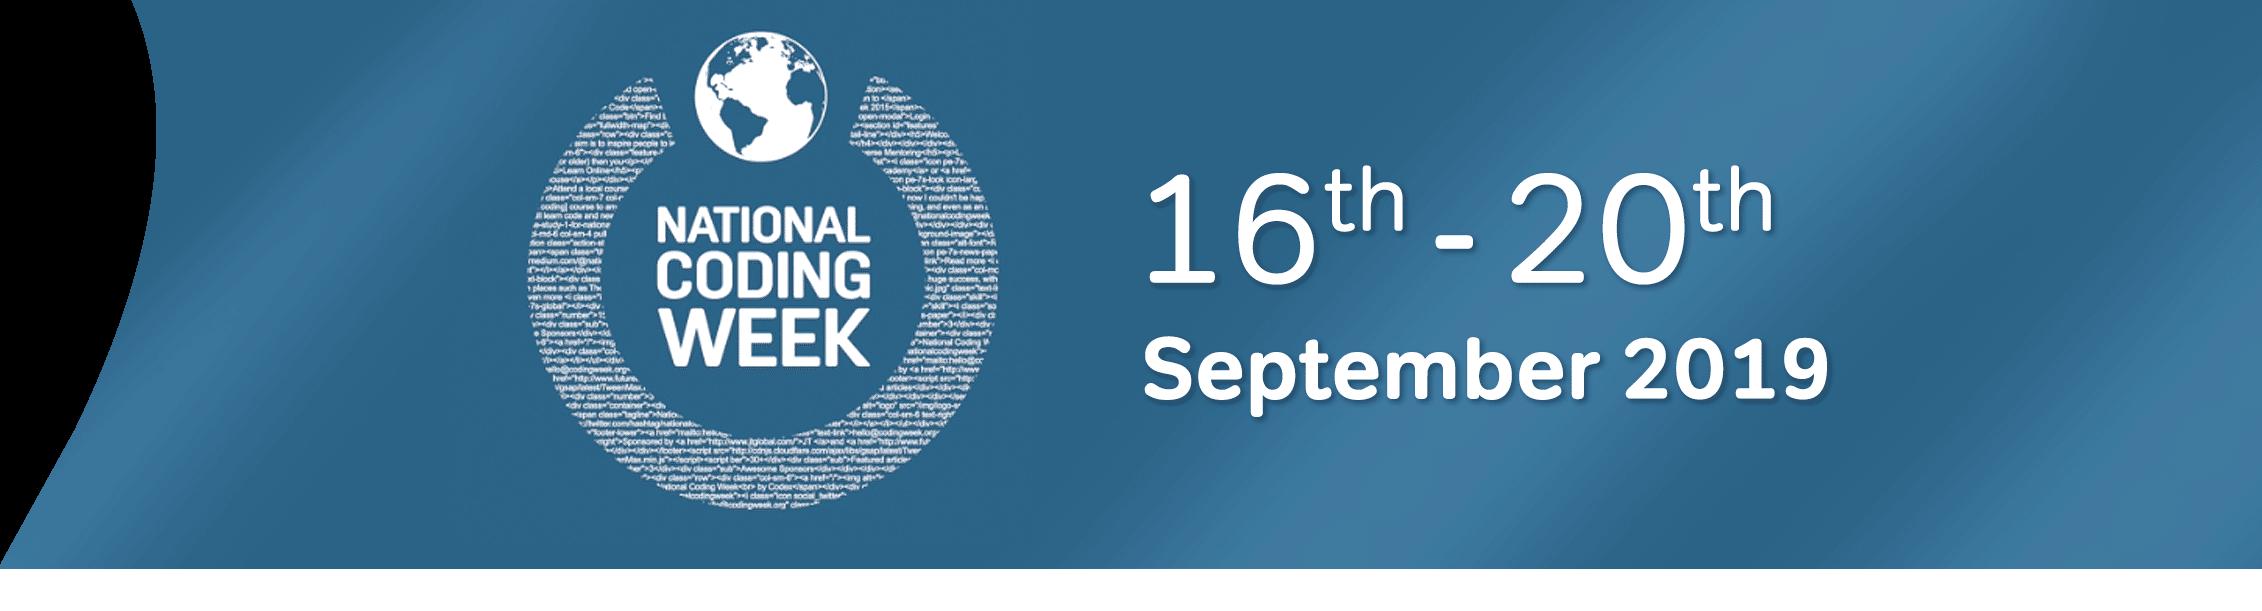 National Coding Week 2019